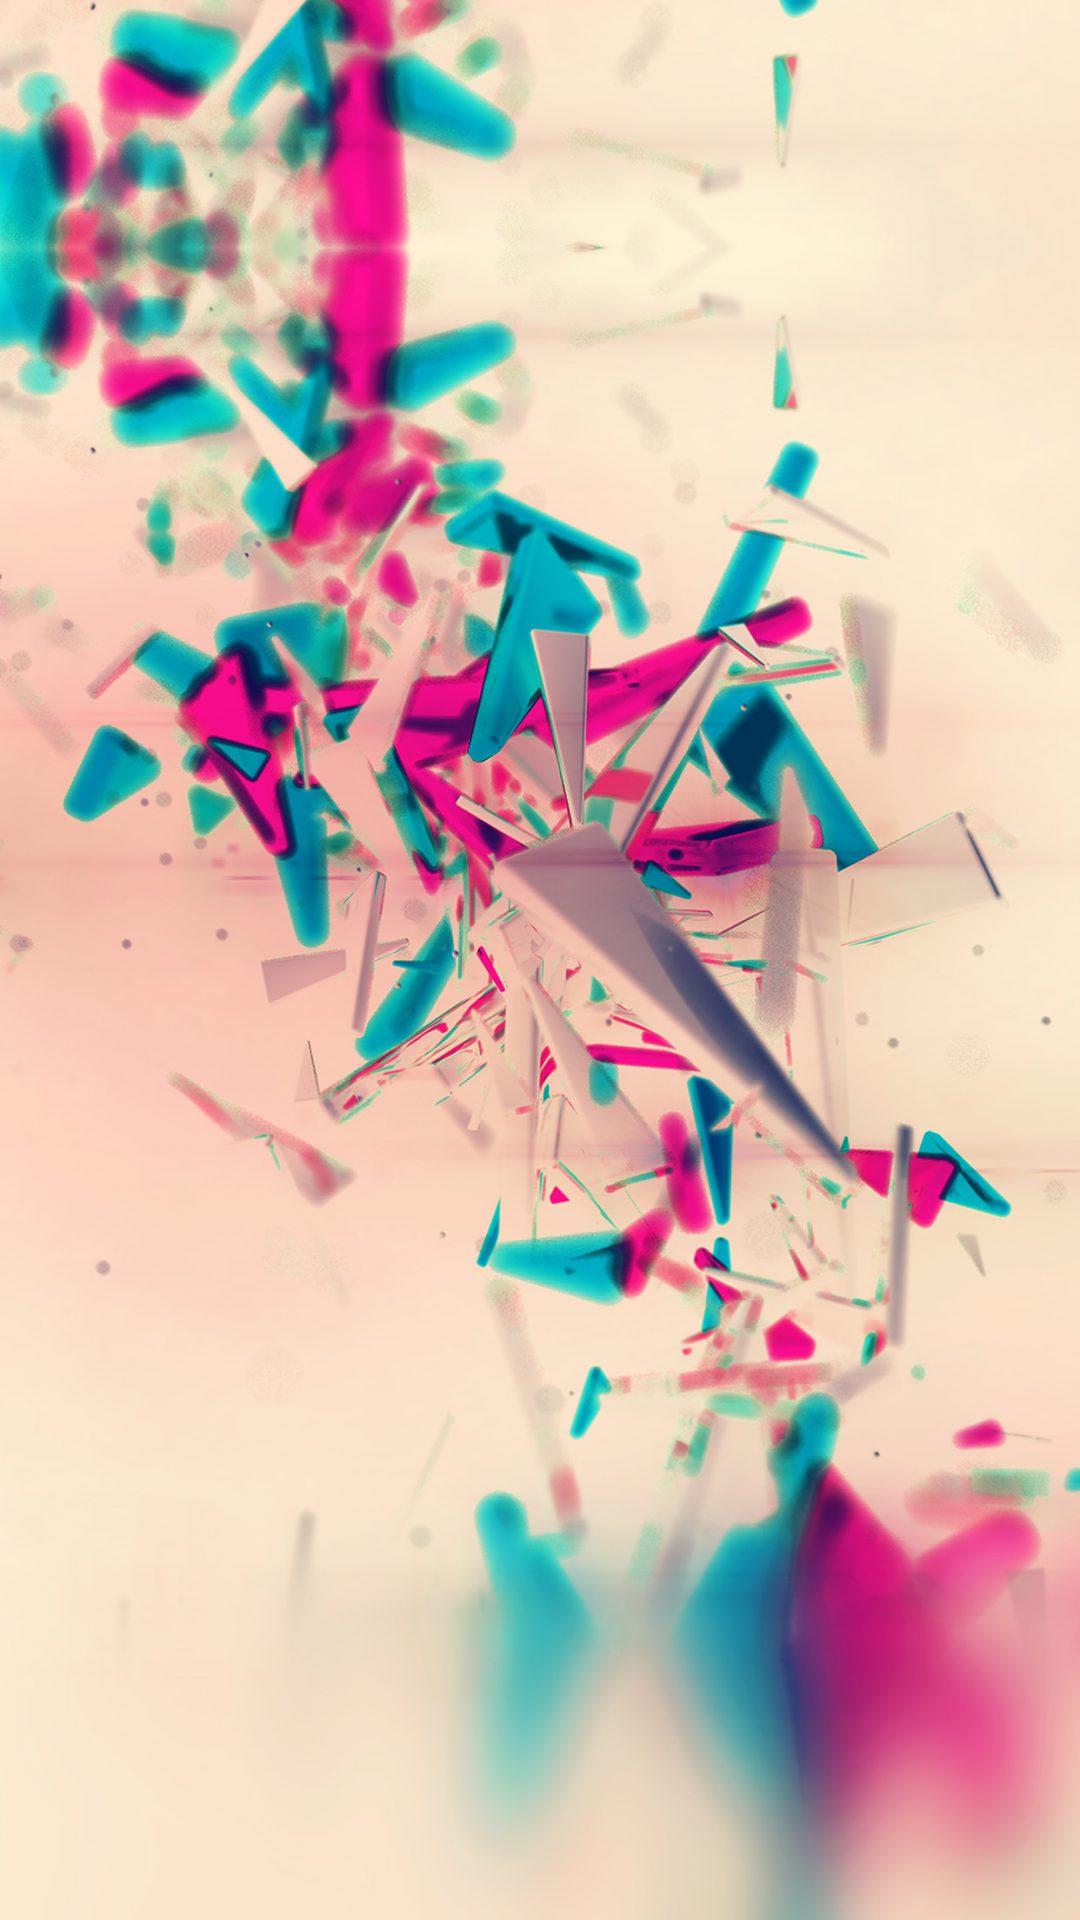 Galaxy Nexus 7 Abstract Pink Digital Pattern